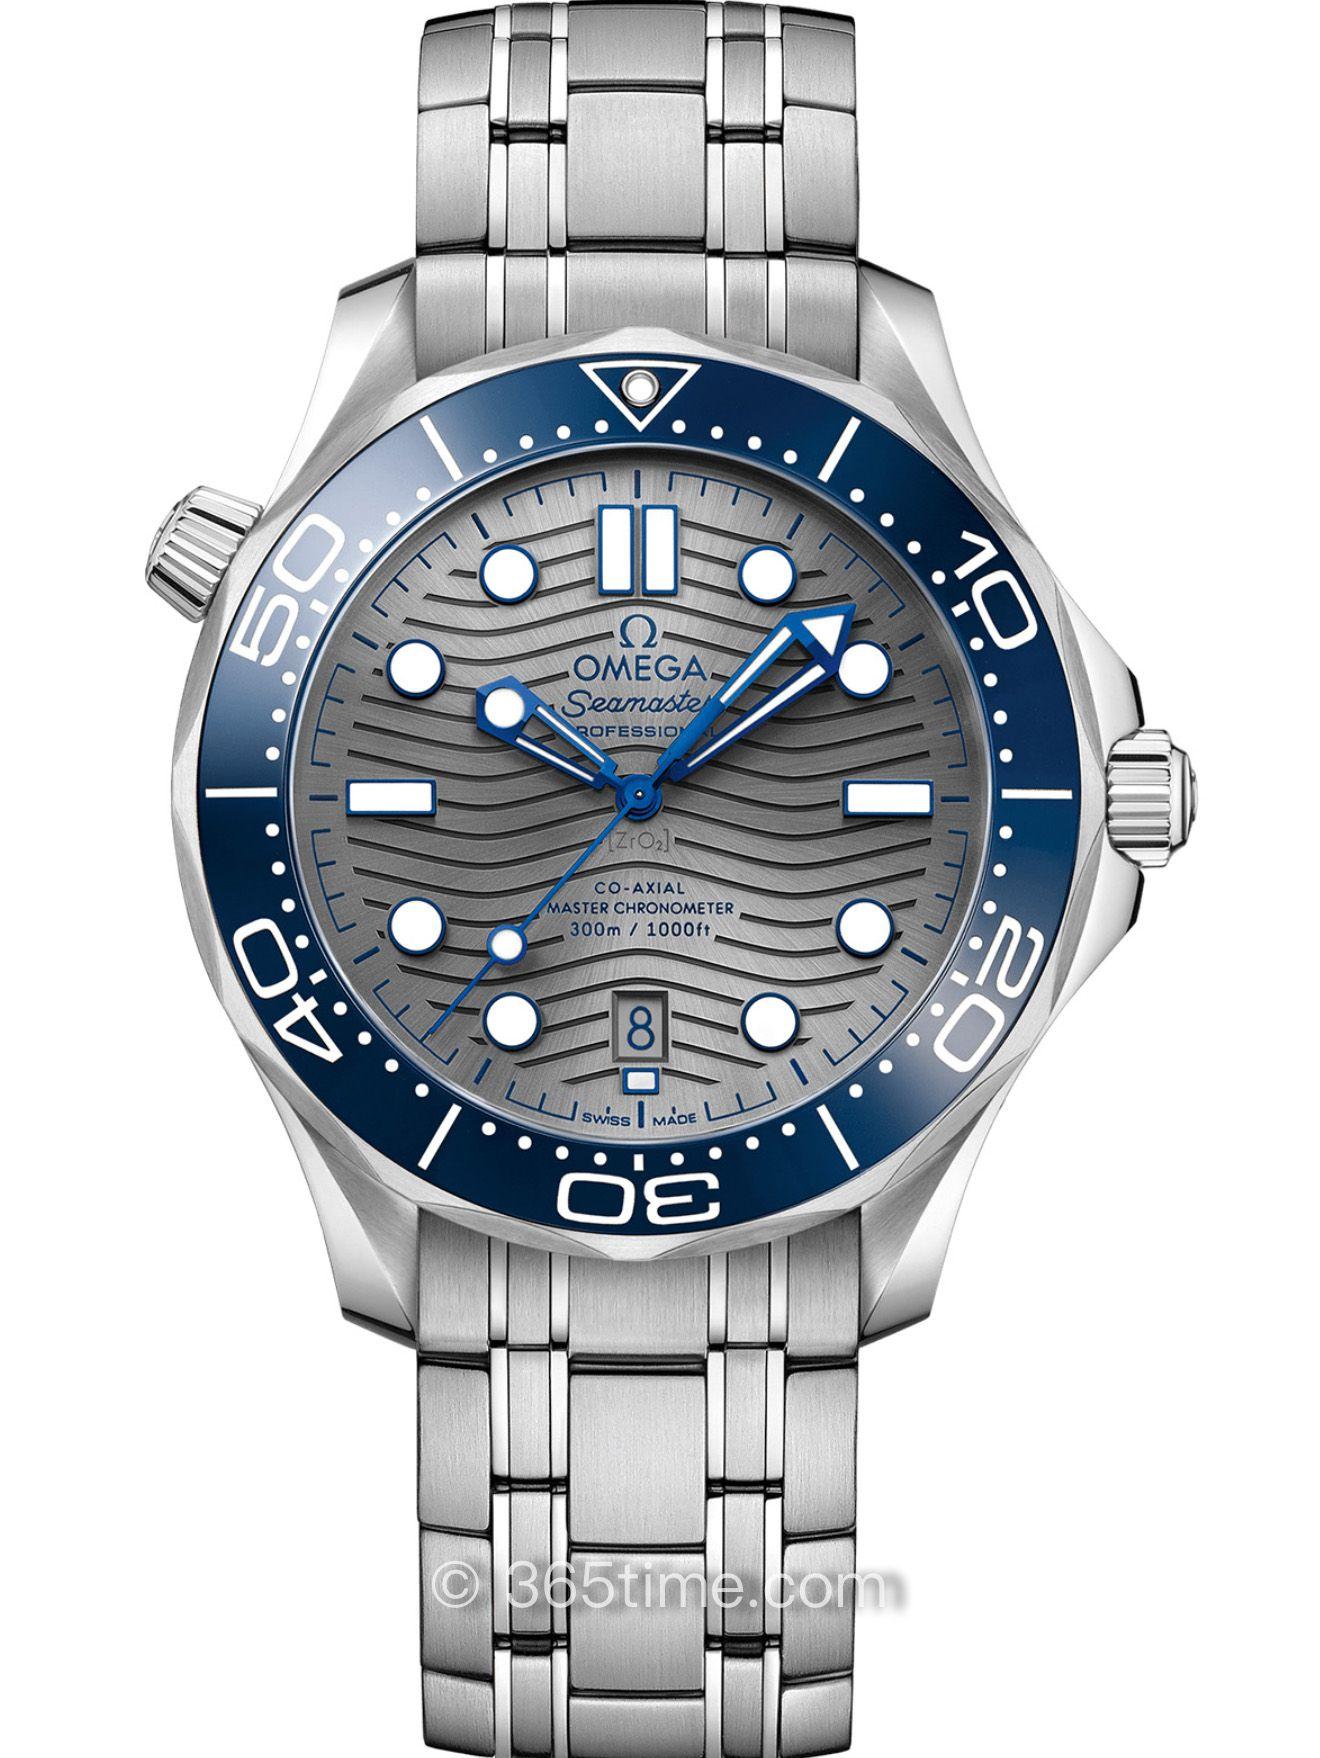 Omega欧米茄海马300米潜水至臻天文台腕表210.30.42.20.06.001